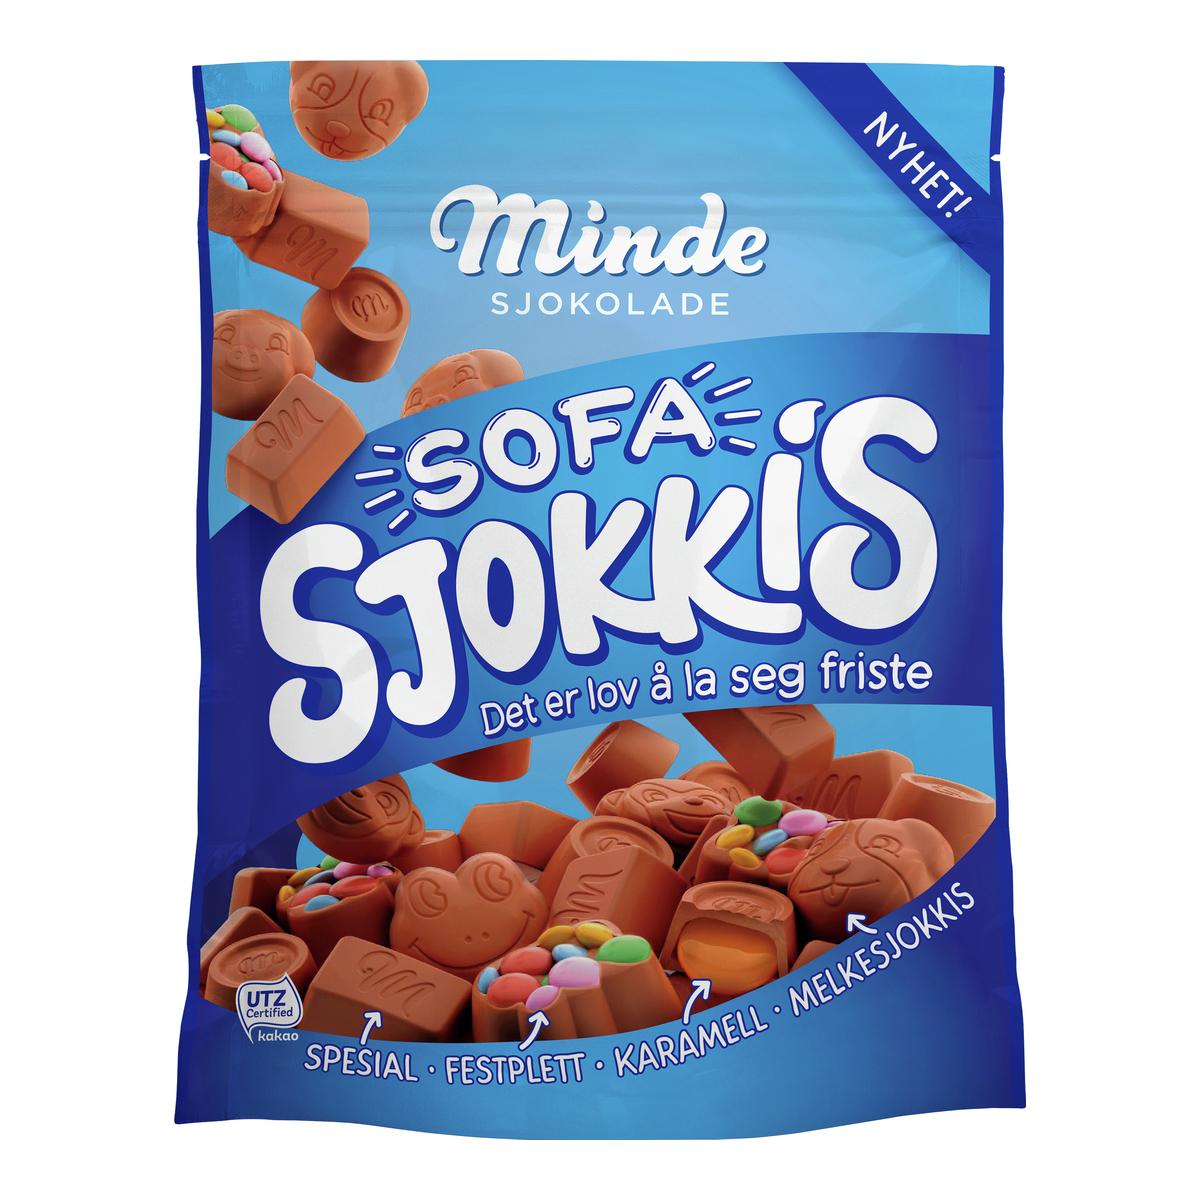 Minde Sofa Sjokkis-SJO971